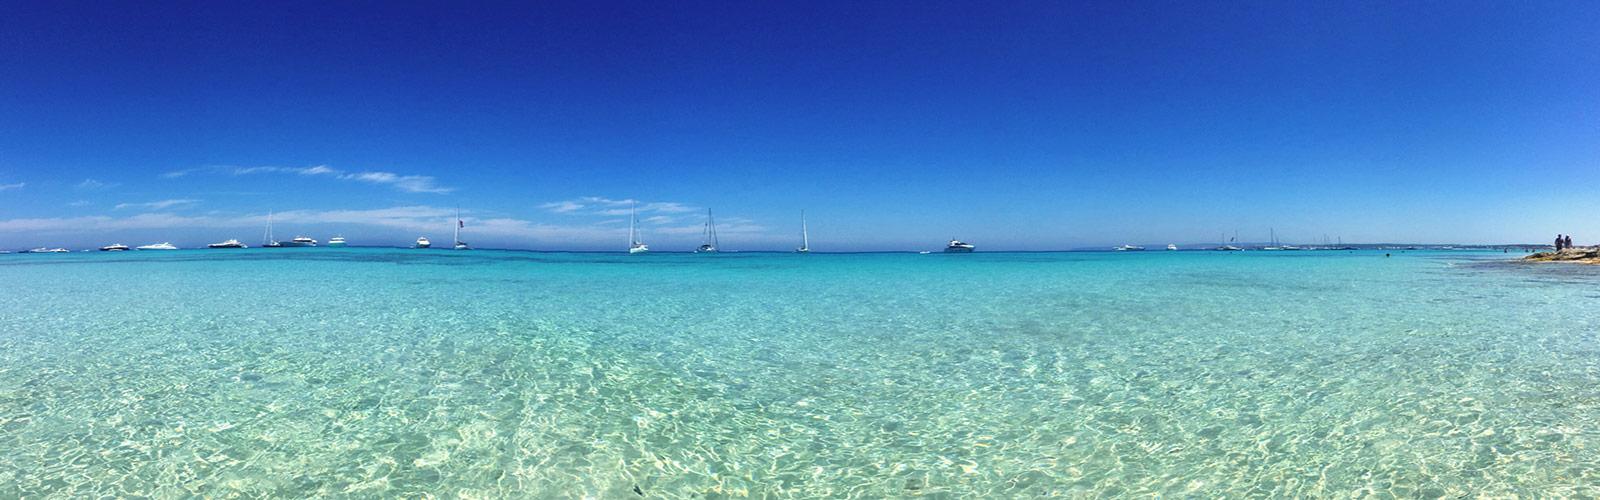 Meer auf Ibiza